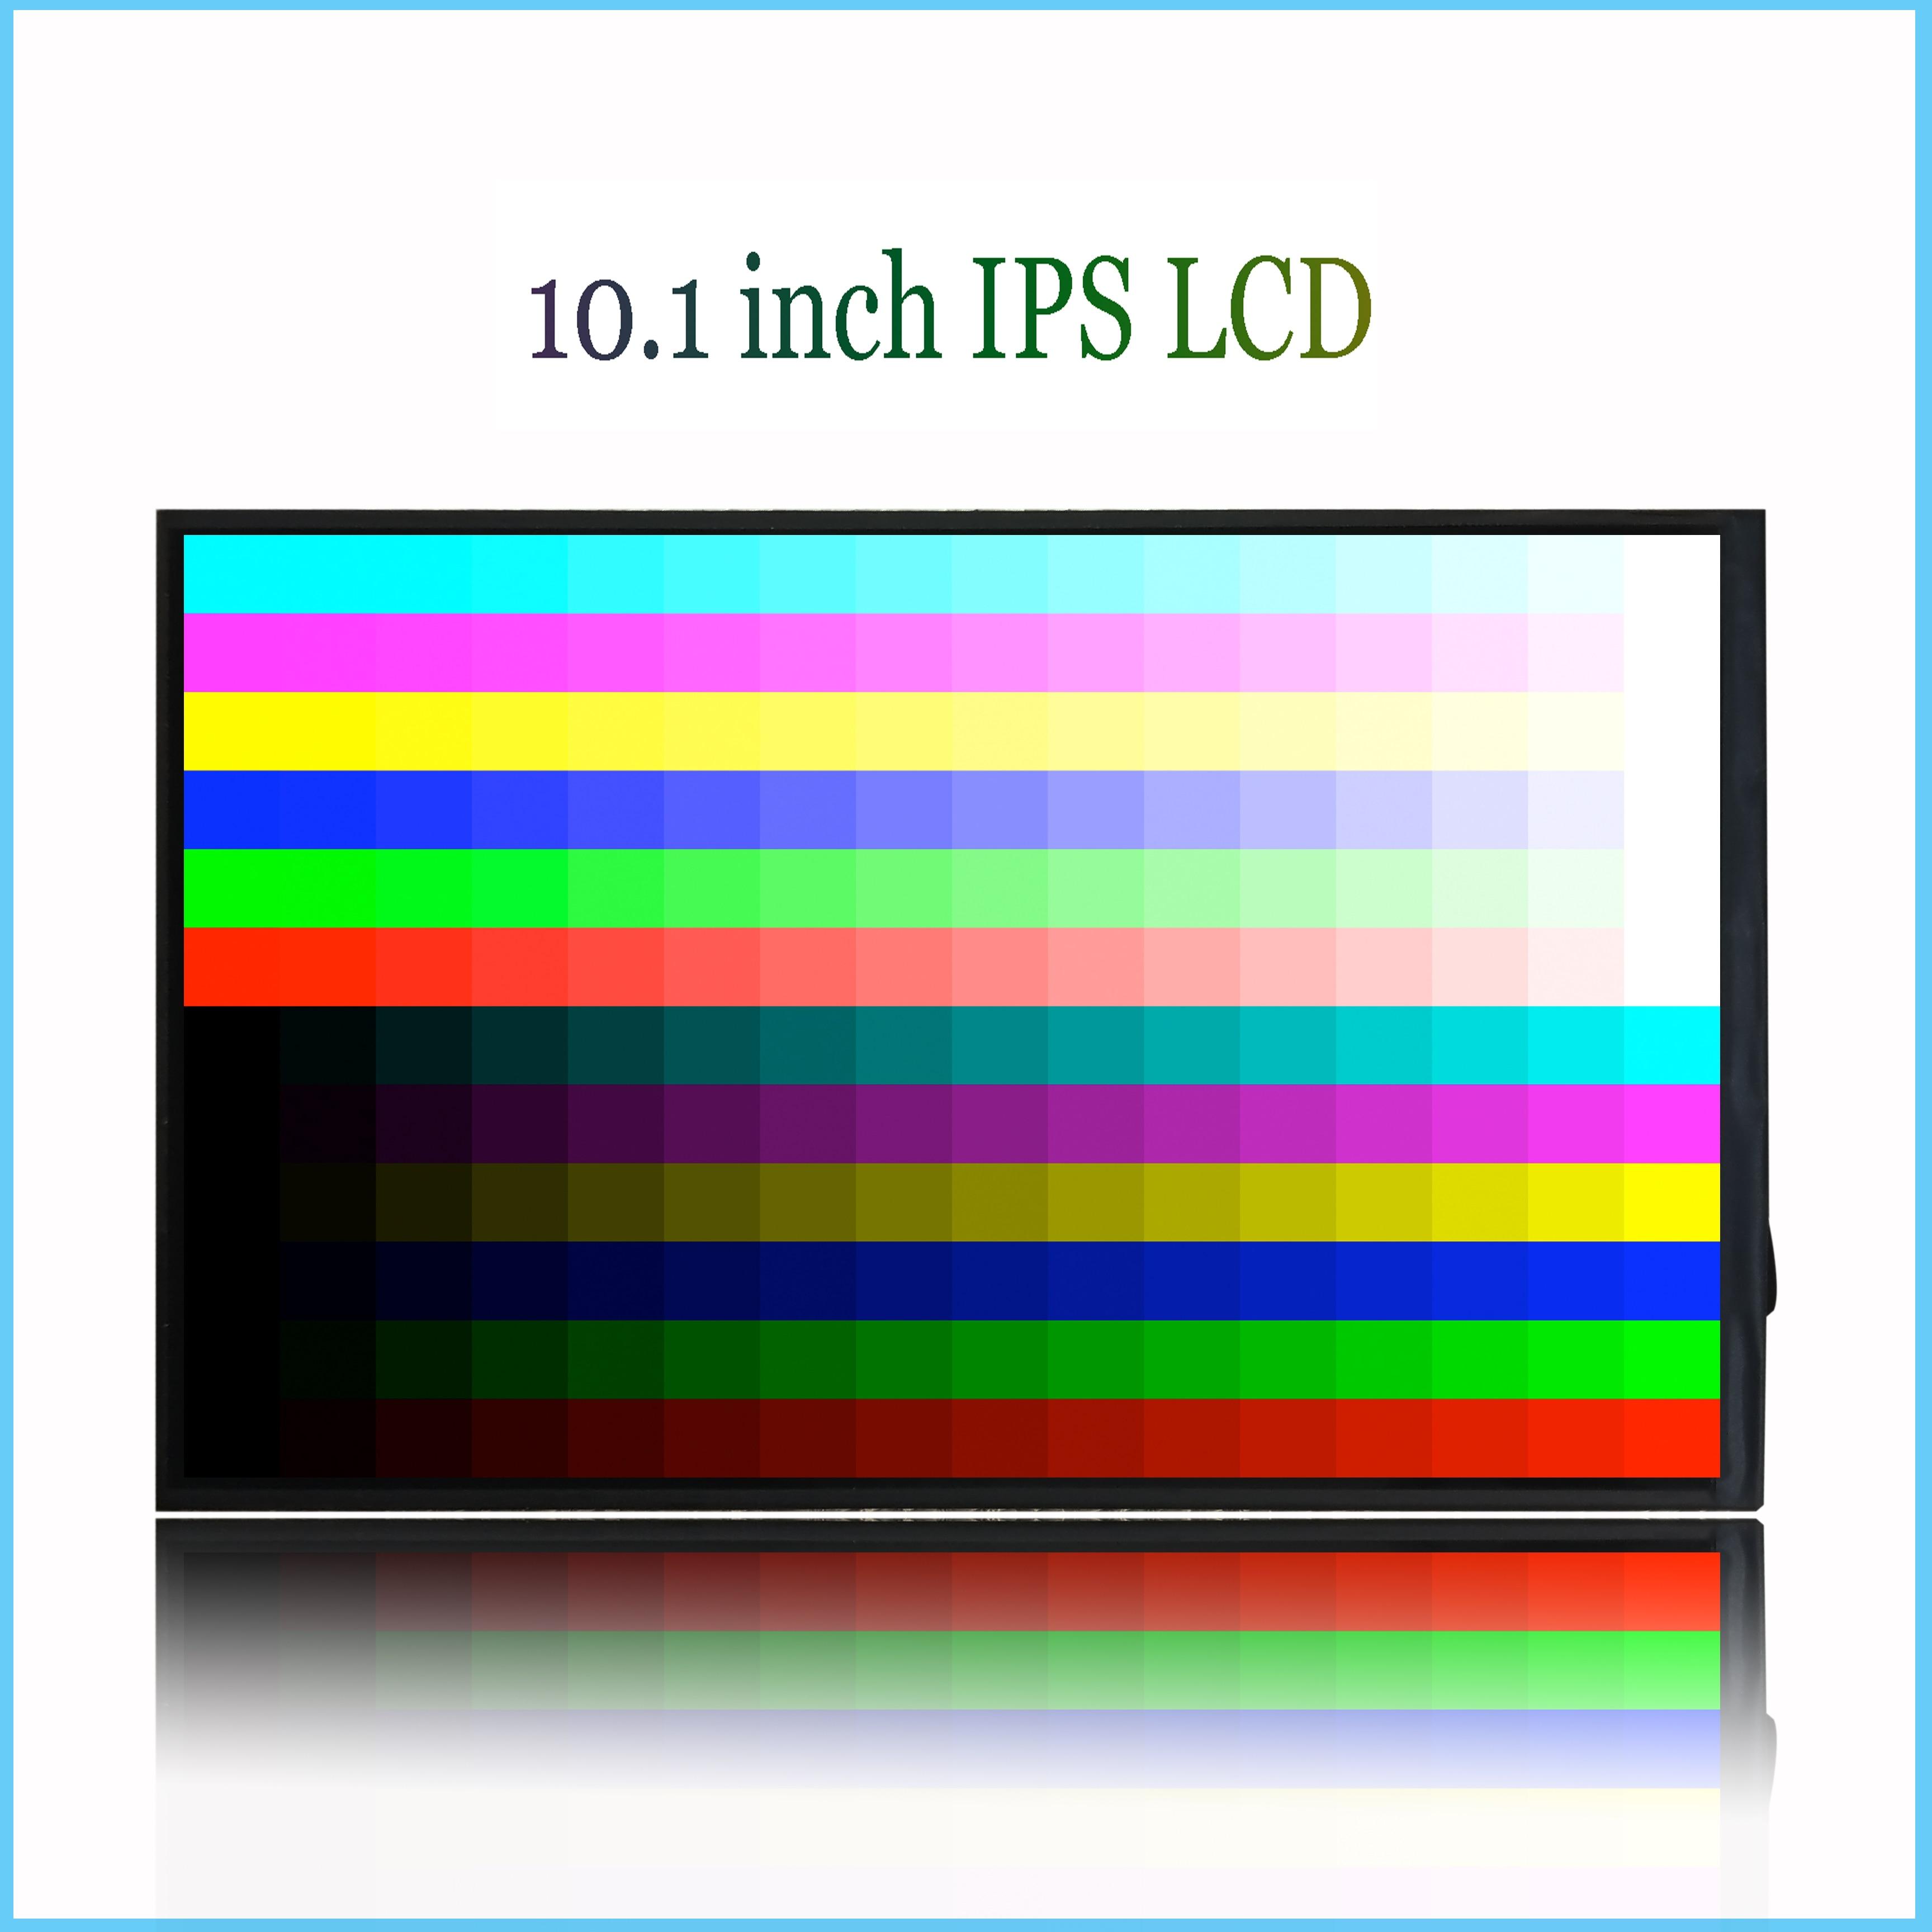 New LCD Display 10.1